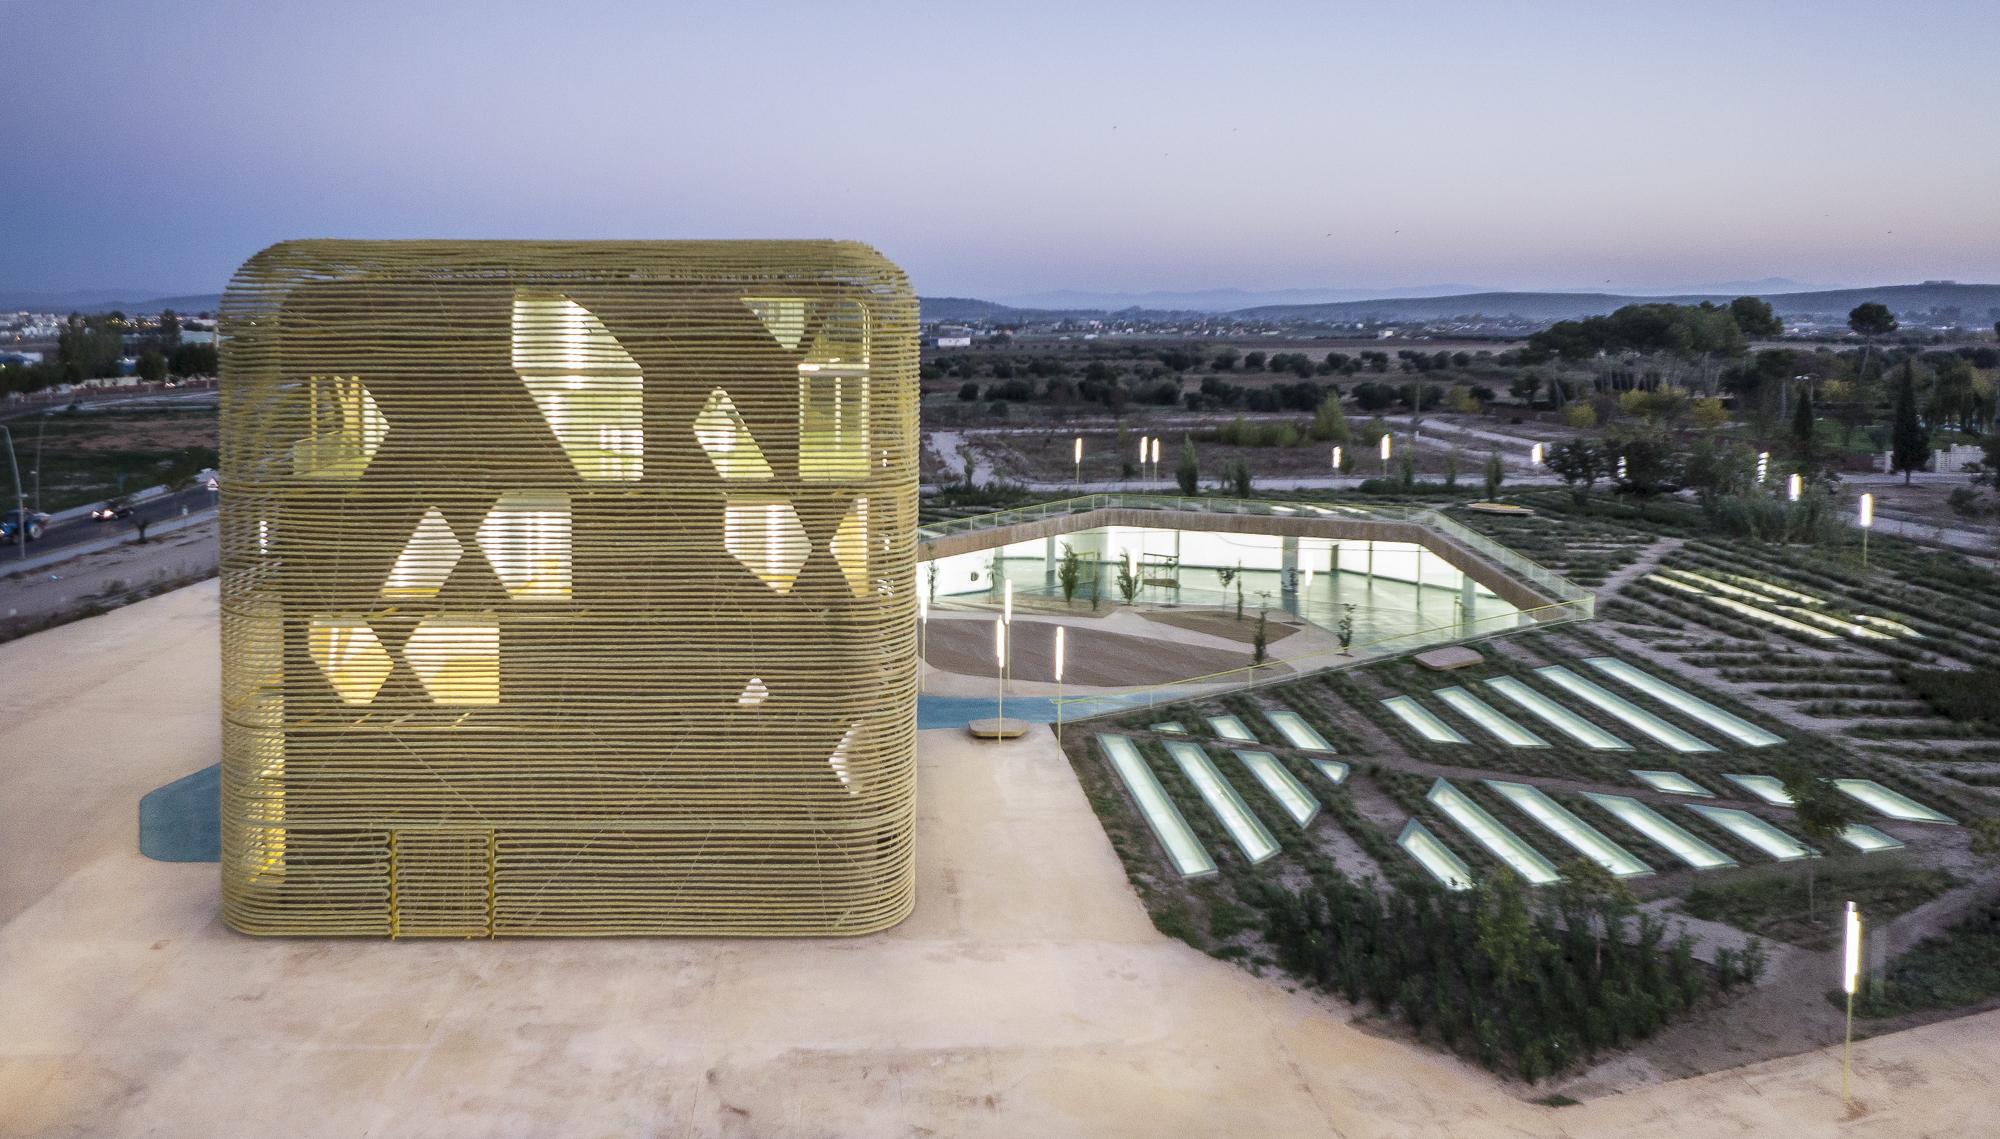 Diseño y arquitectura de Auditorio | Plataforma Arquitectura